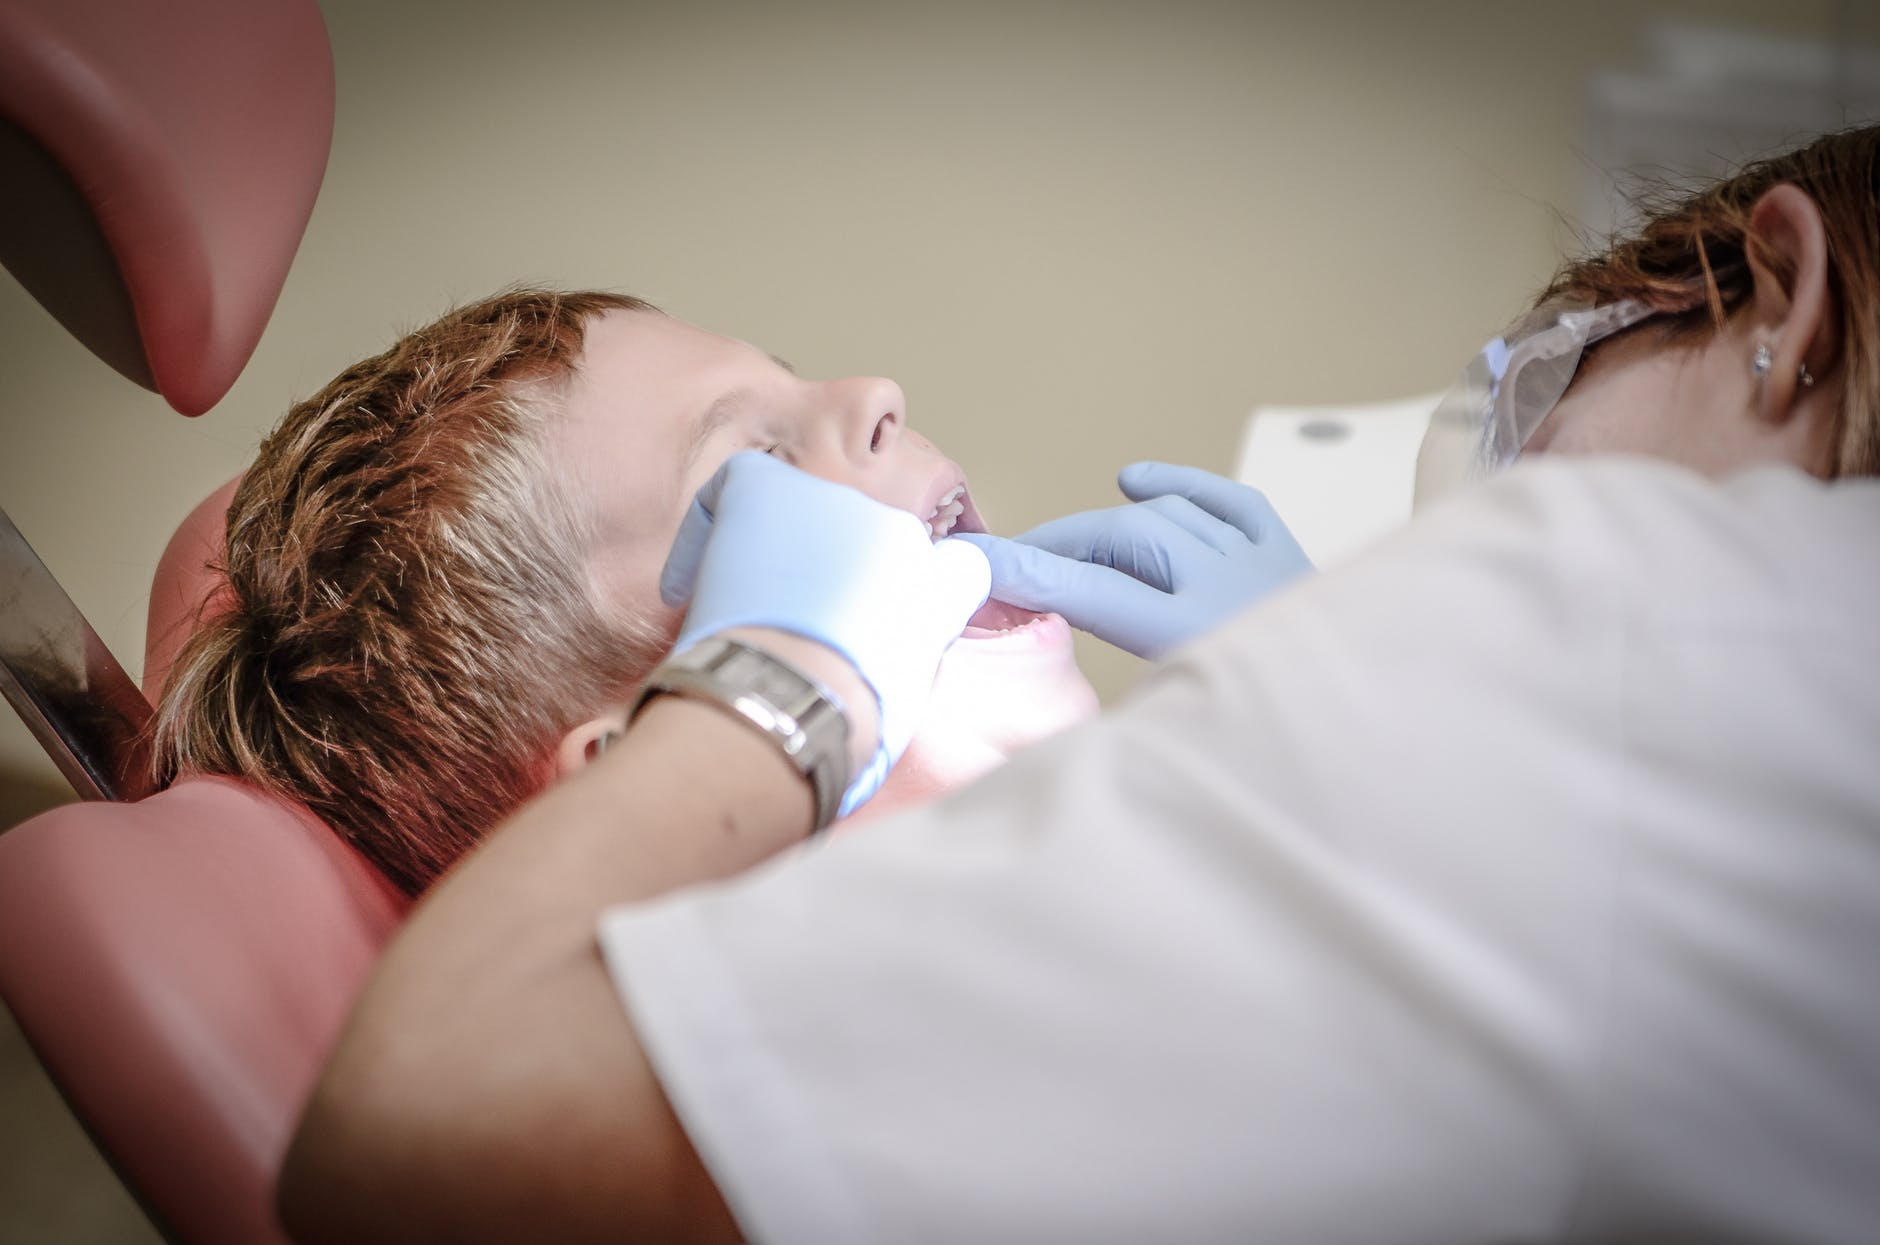 Pediatric Dentistry 101: What Does a Pediatric Dentist Do?